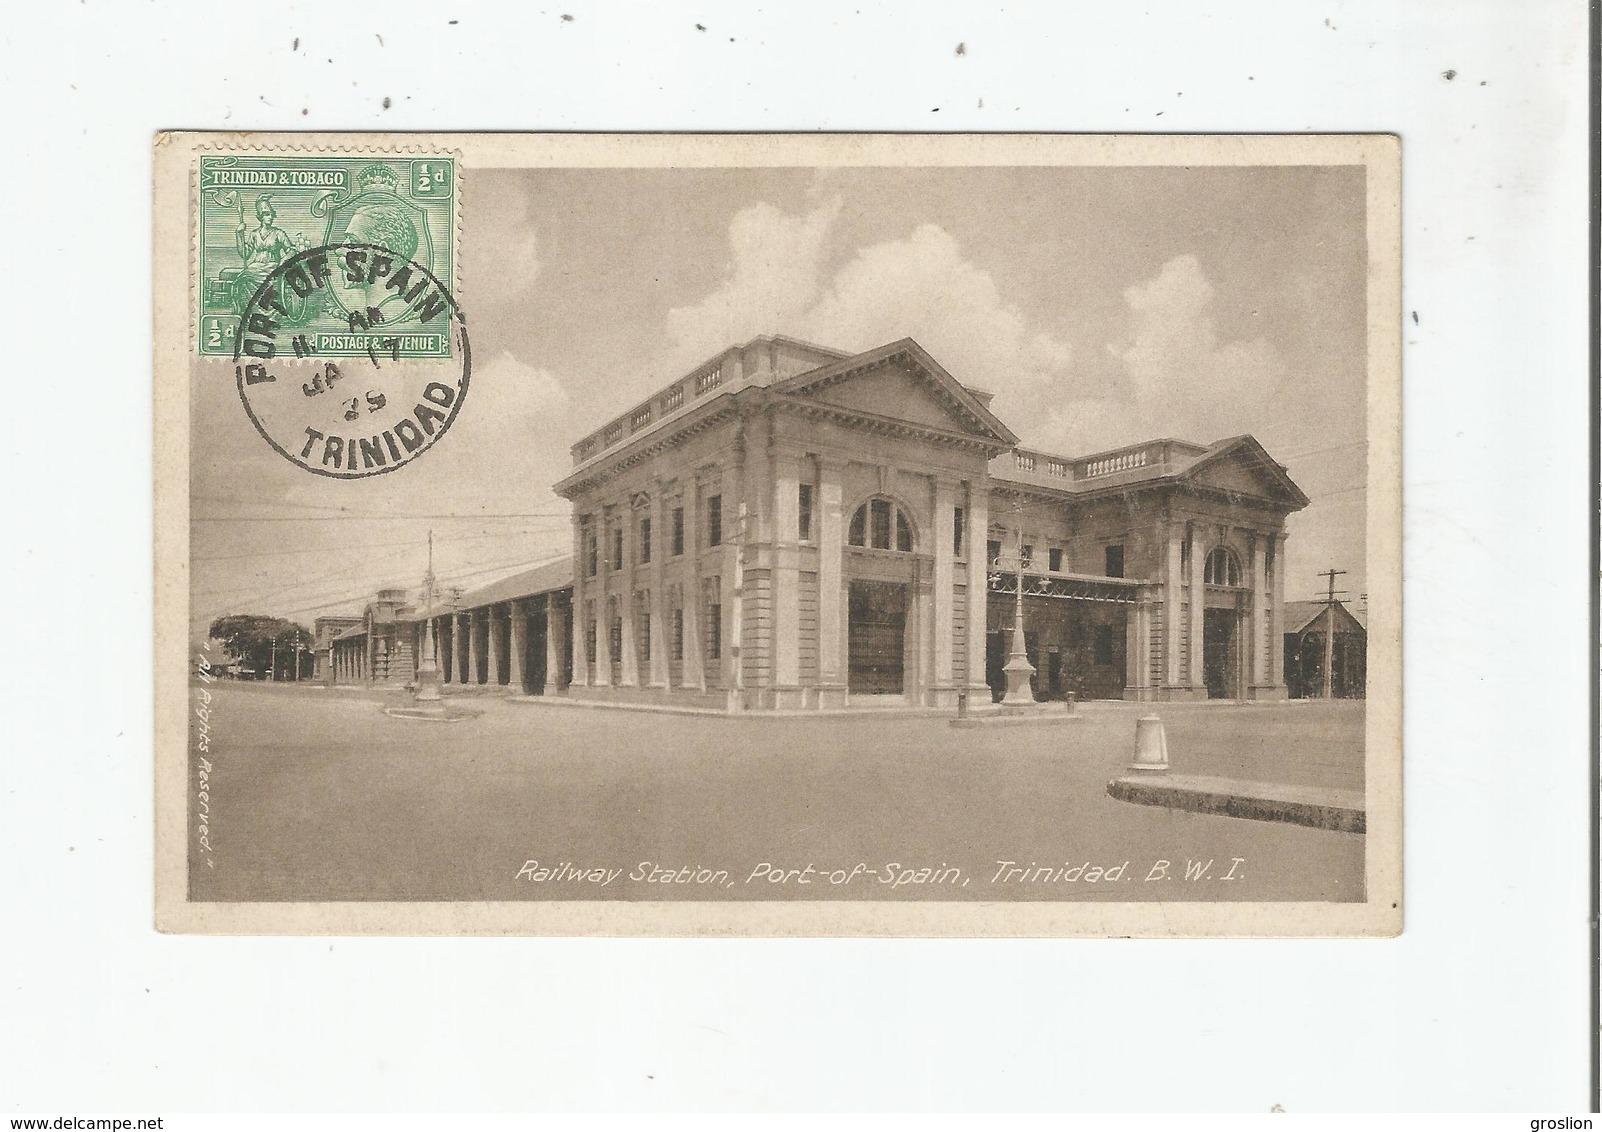 TRINIDAD RAILWAY STATION PORT OF SPAIN B W I - Trinidad